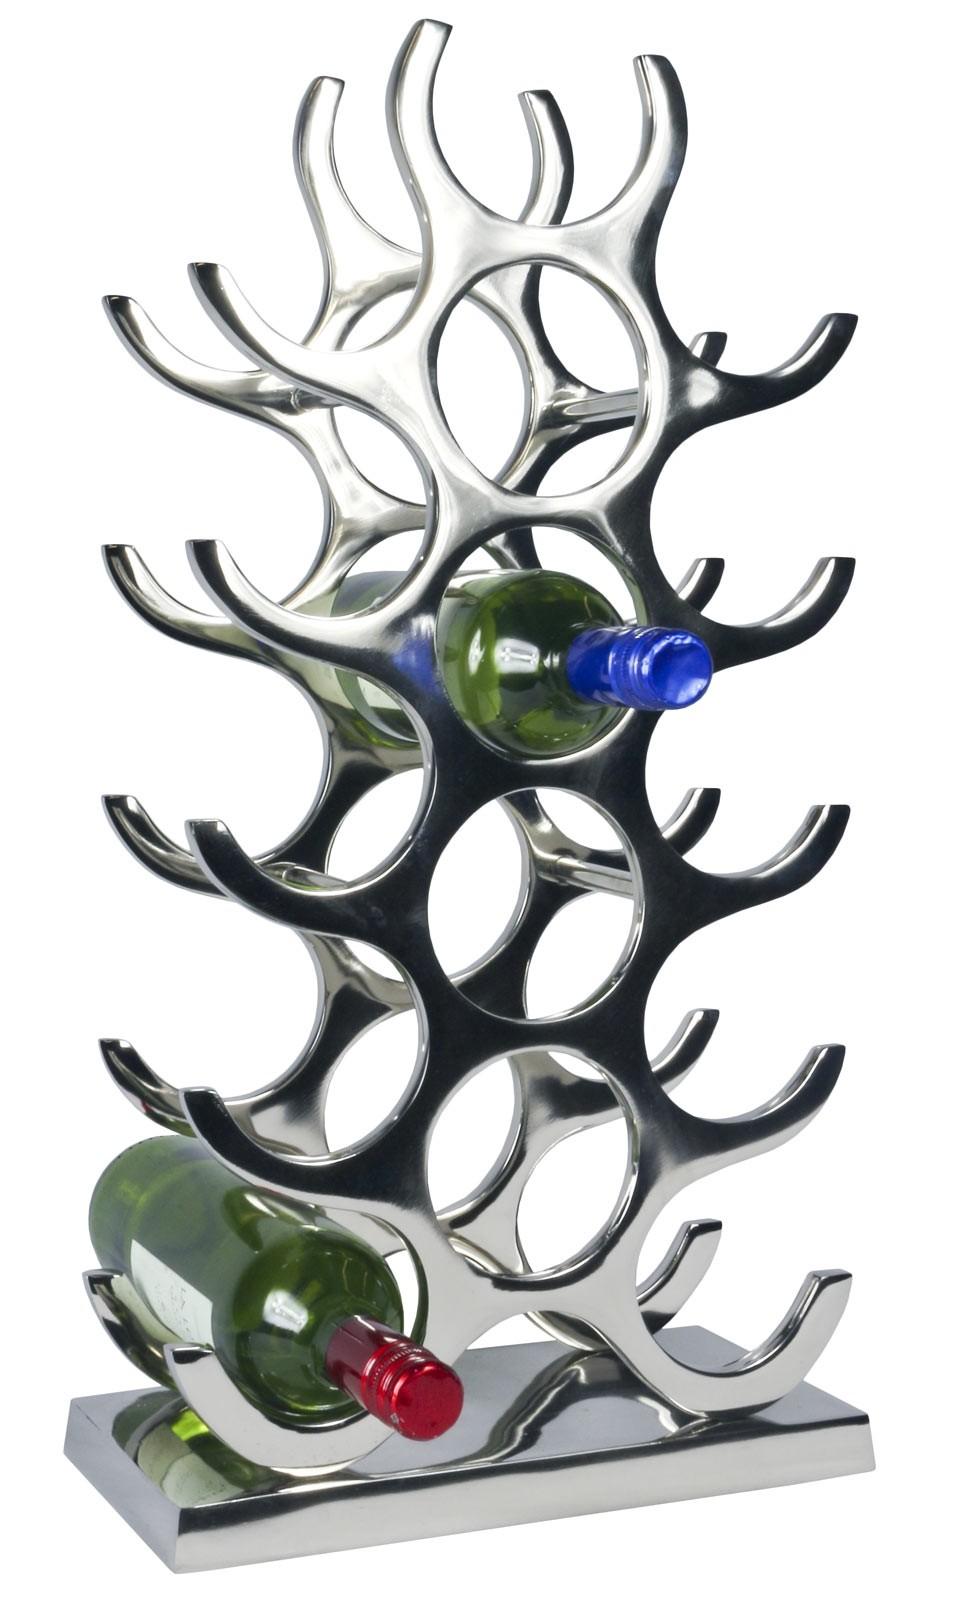 15 Bottle Wine Holder - Aluminium / Nickel Finish